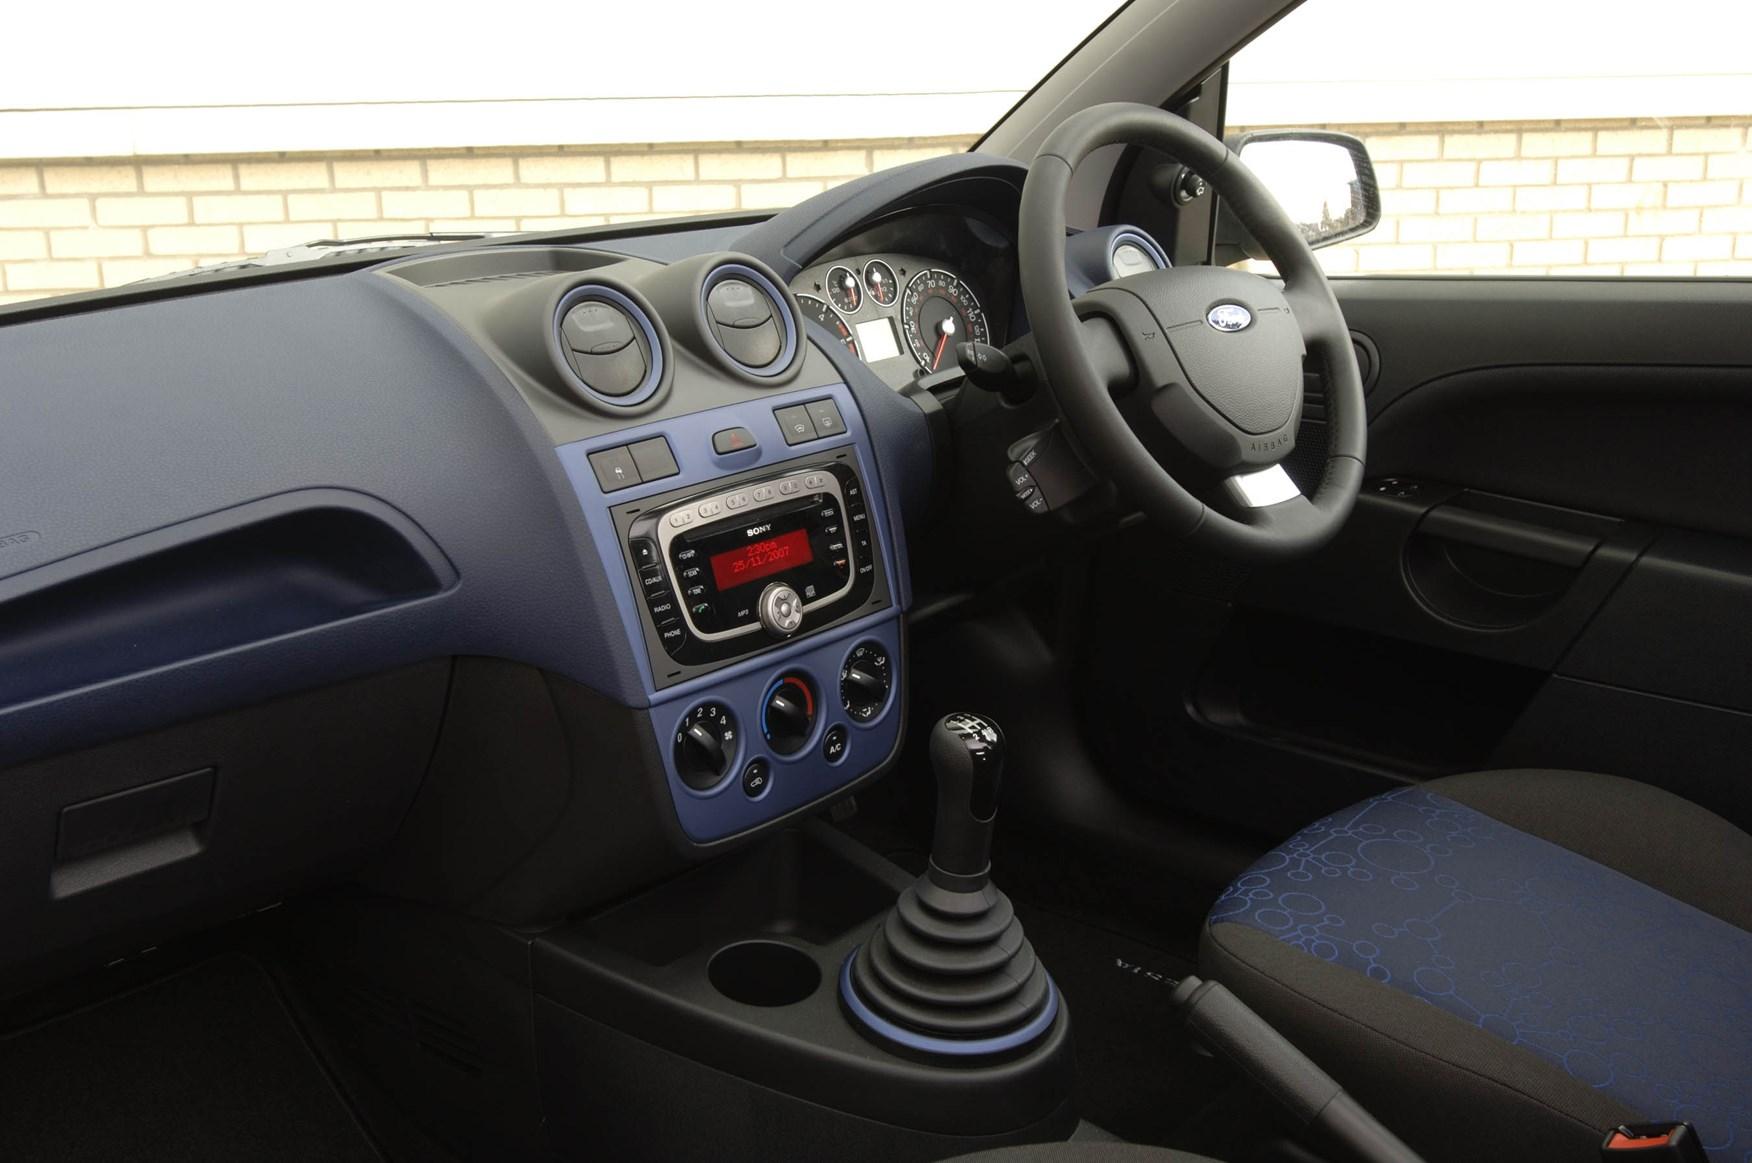 Internal door diagram 2013 ford fiesta ford auto parts for 06 jeep liberty window regulator recall